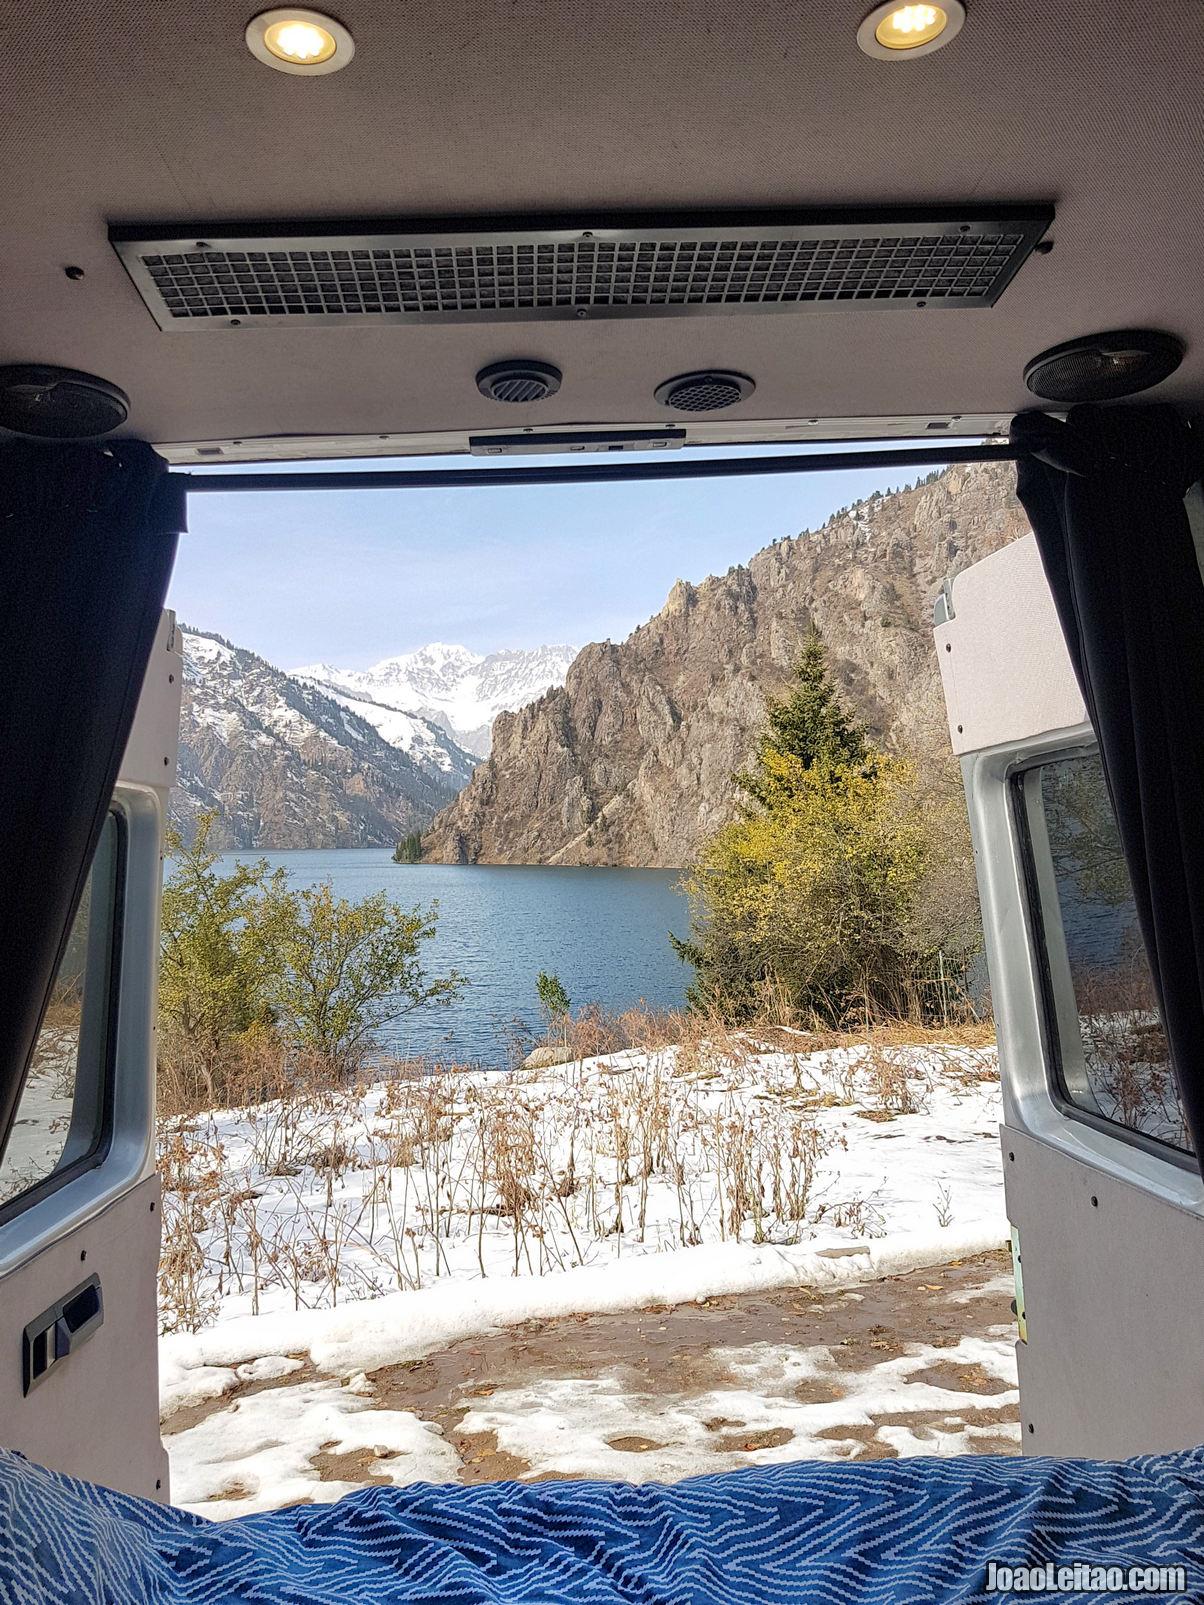 Vista da porta de trás da auto-caravana no Lago Sary-Chelek